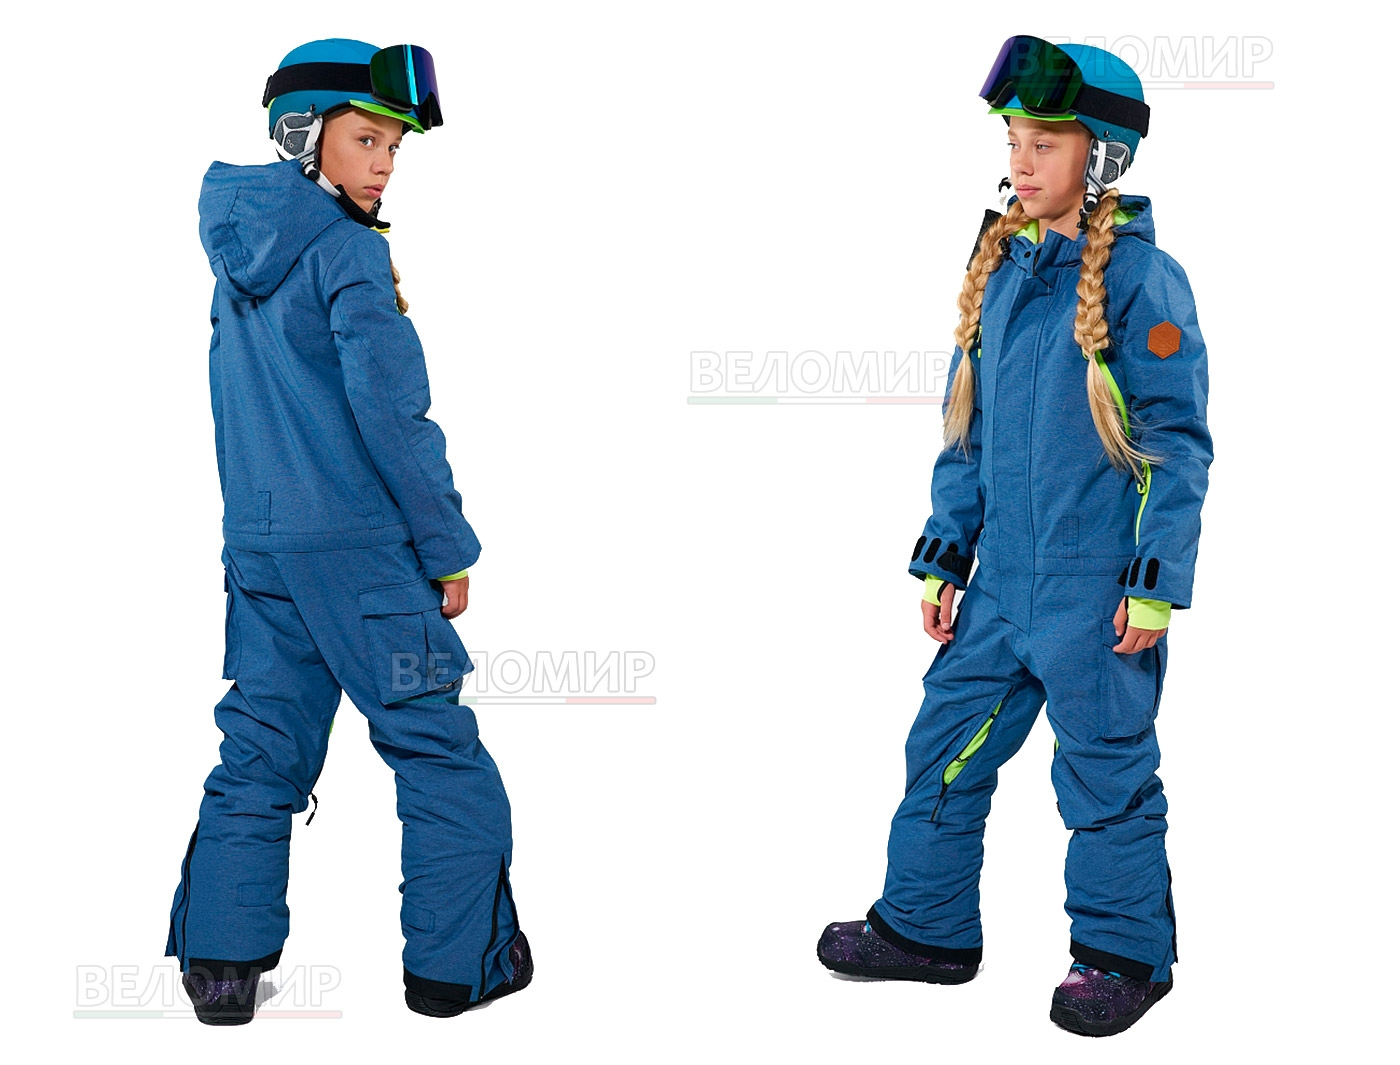 Комбинезон Cool Zone FUN KN 3115/01/1 TEENS Темно-Синий джинс (2020)